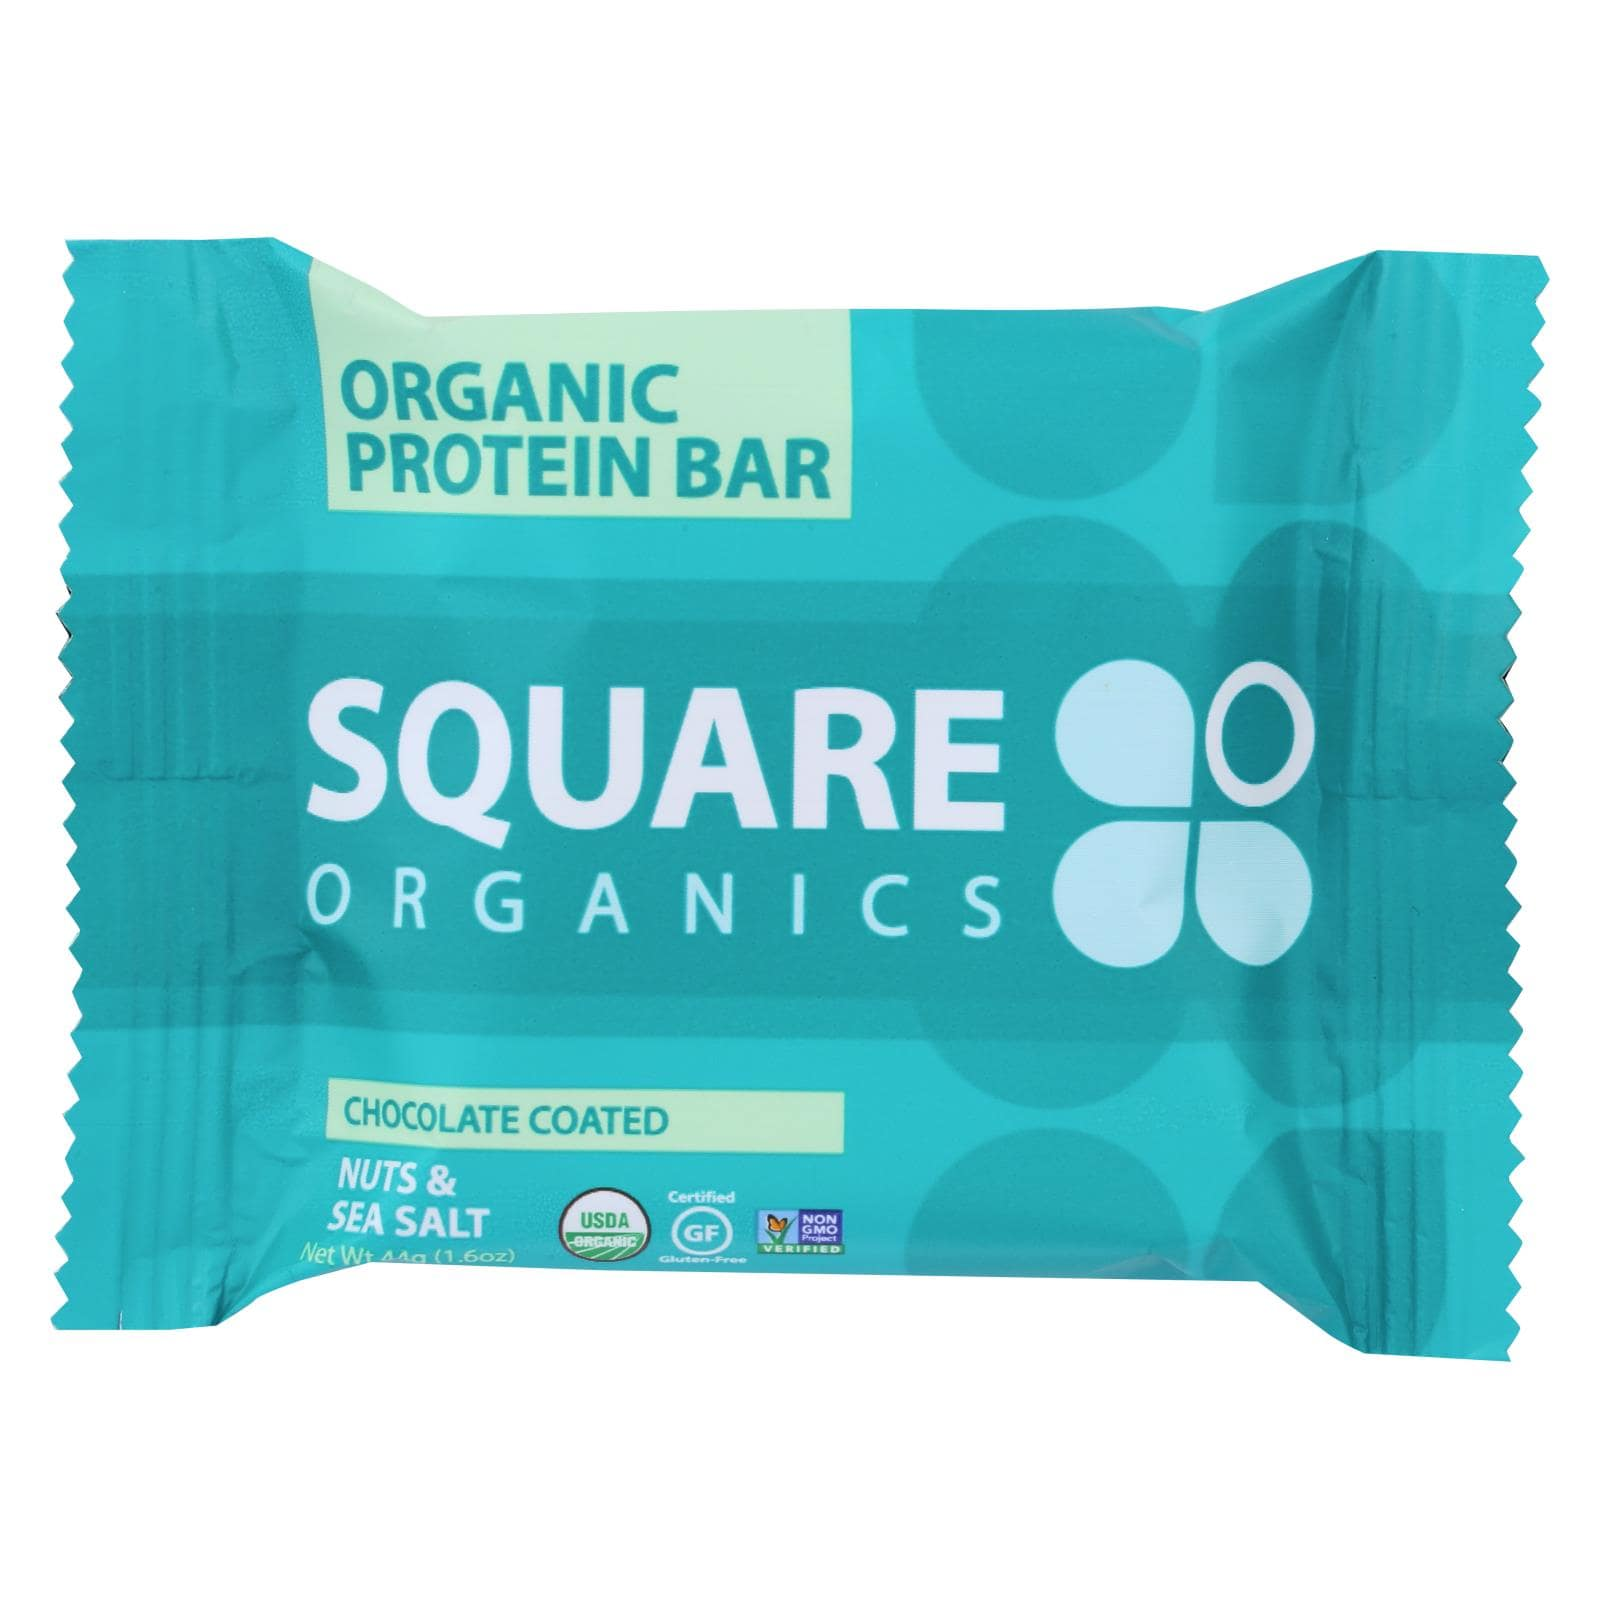 Square Organics Protein Bar - Chocolate Coated Nuts & Sea Salt